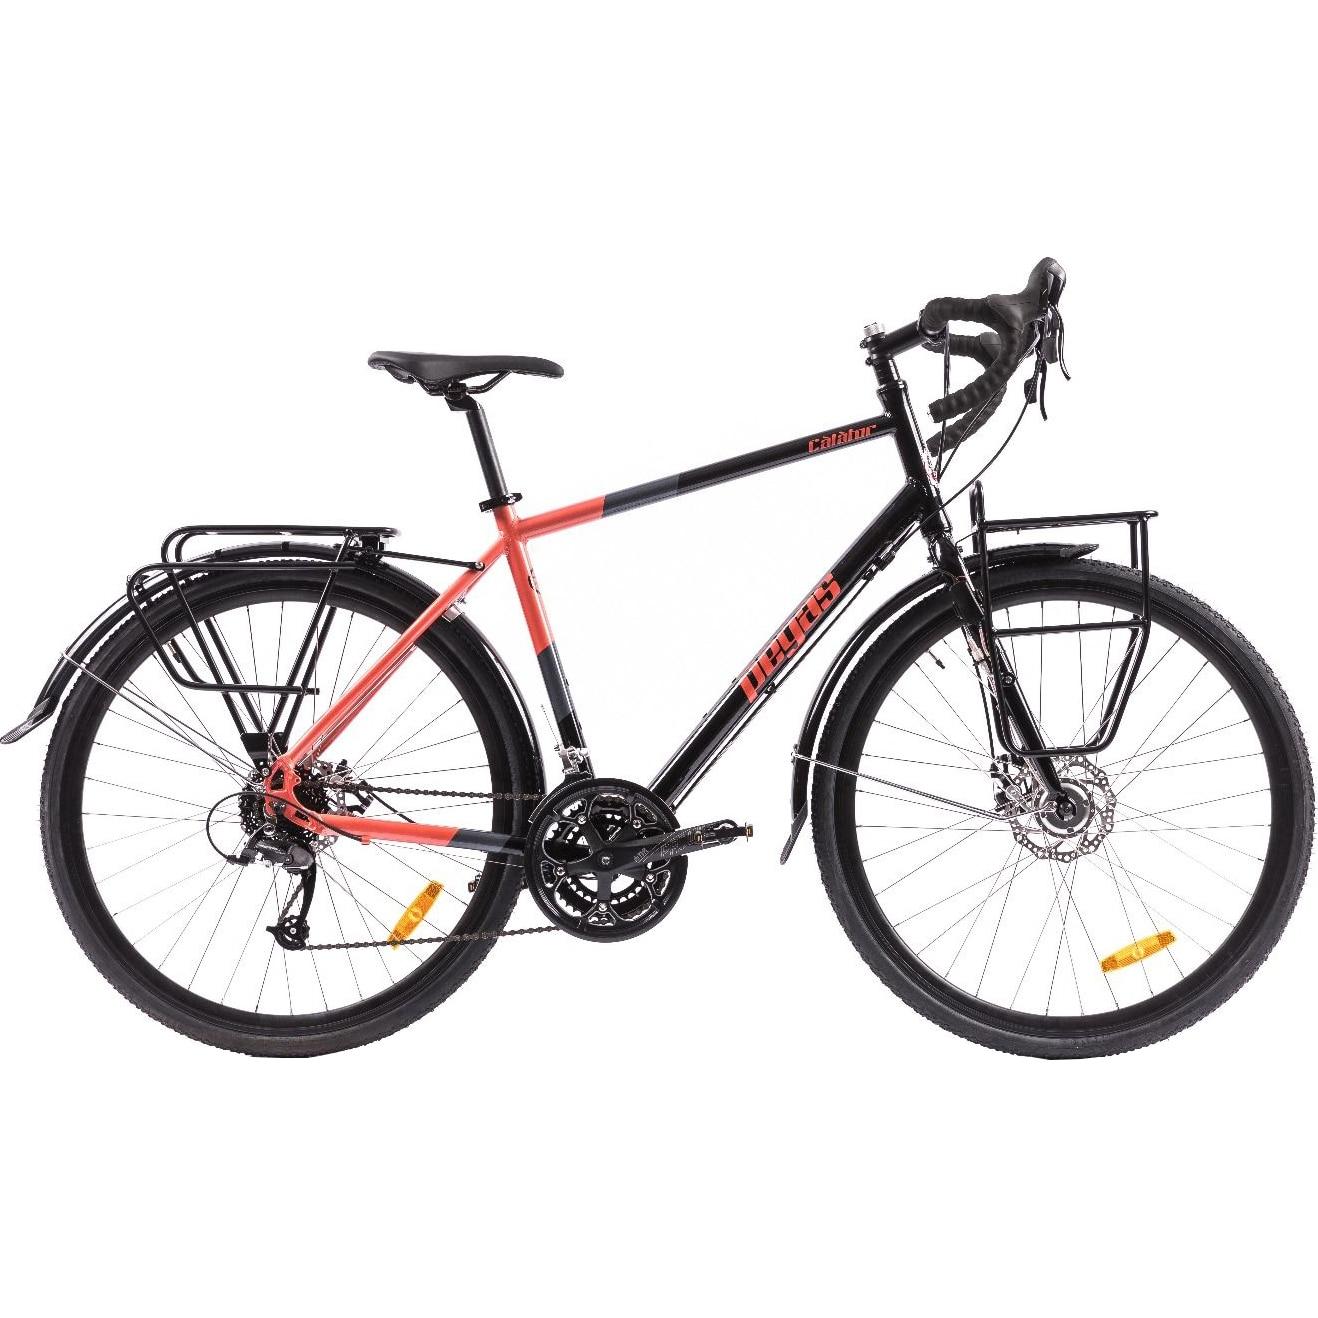 "Fotografie Bicicleta Pegas Calator 28"", L/52,5cm, Negru Portocaliu"